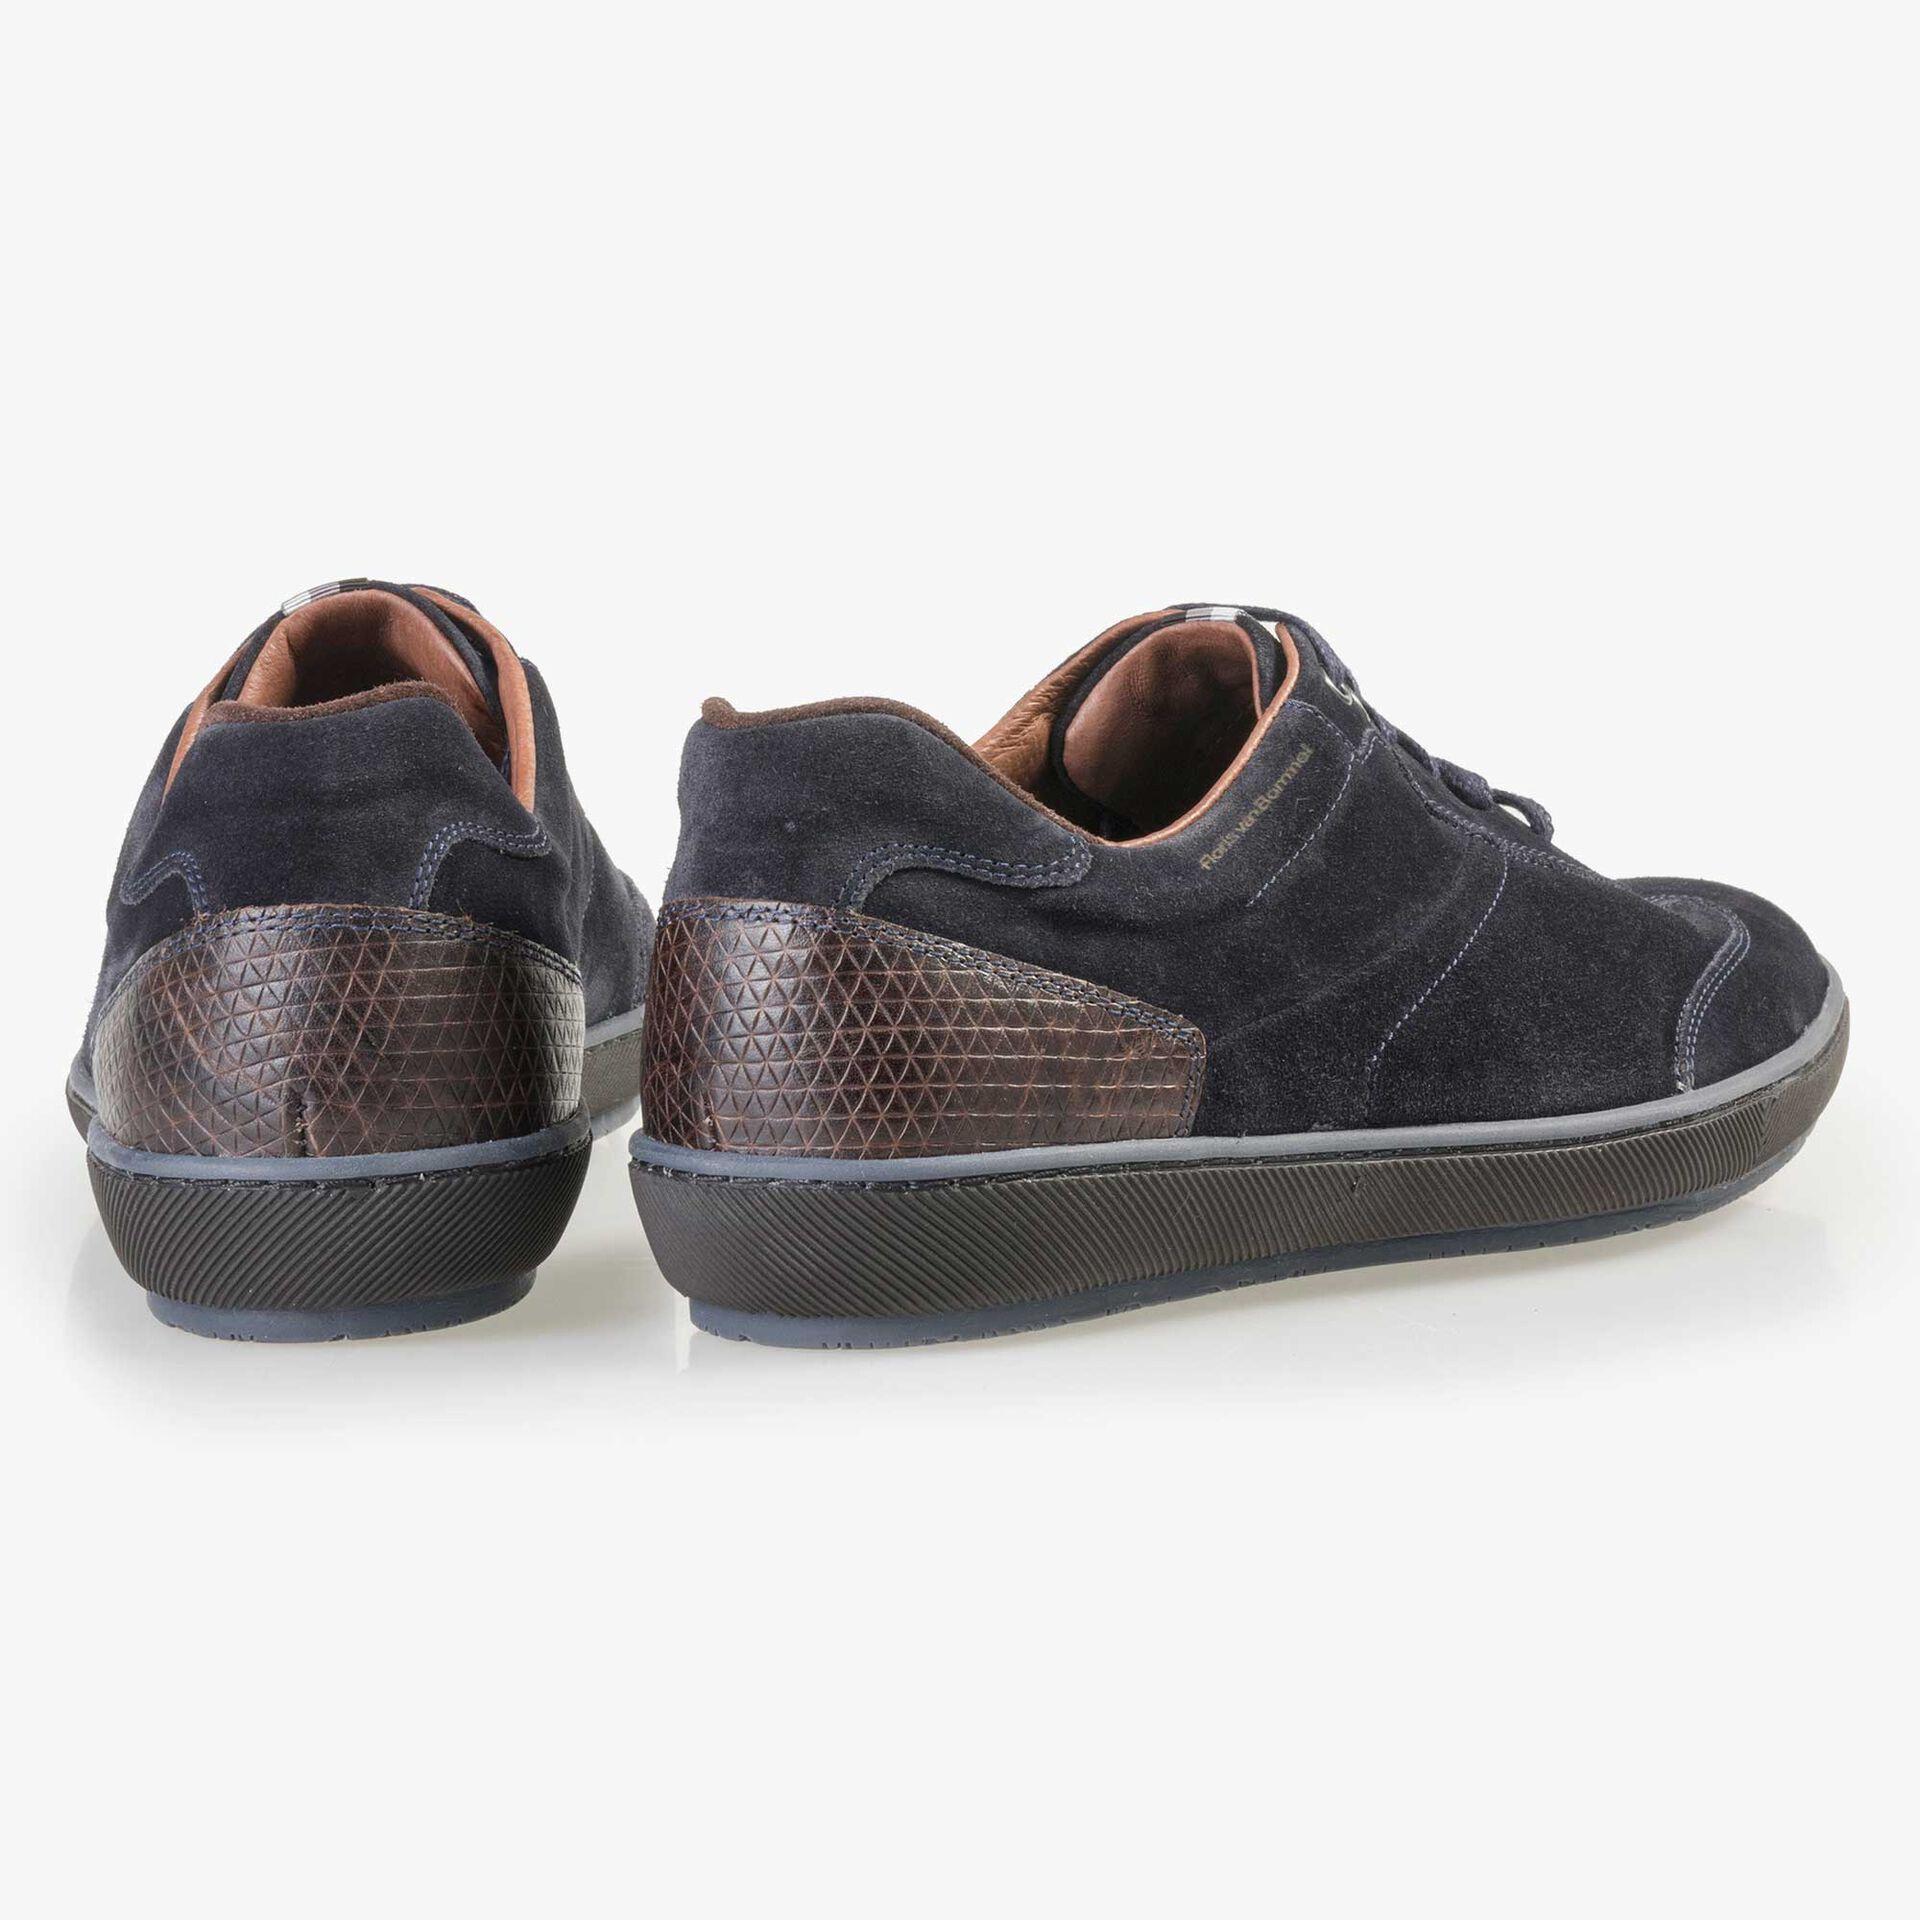 Floris van Bommel men's blue suede leather sneaker